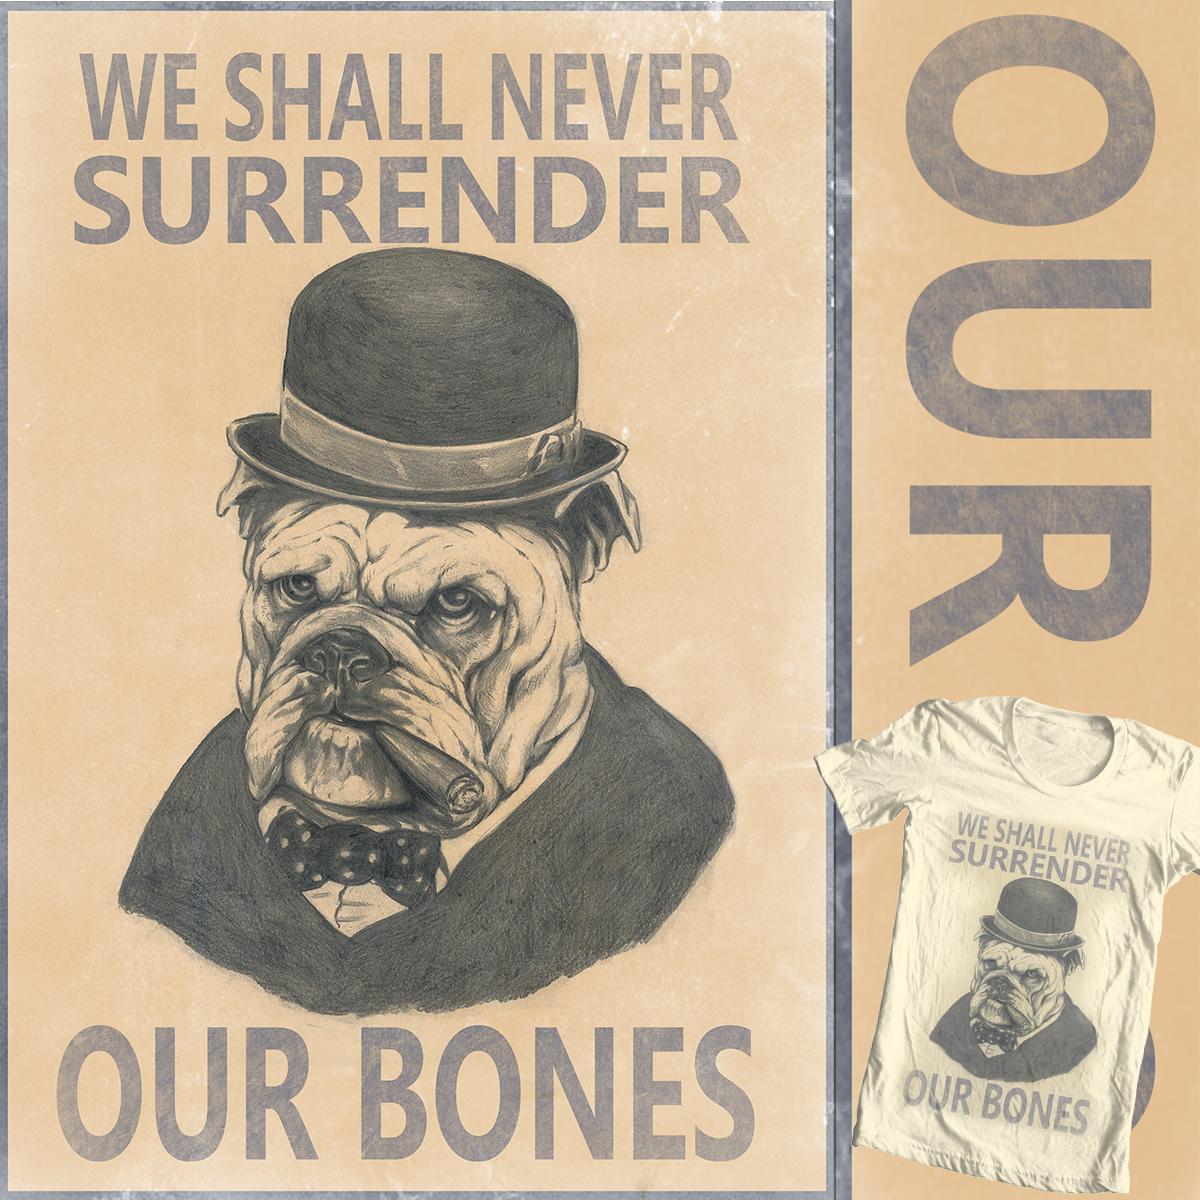 Our Bones by Herculoid on Threadless